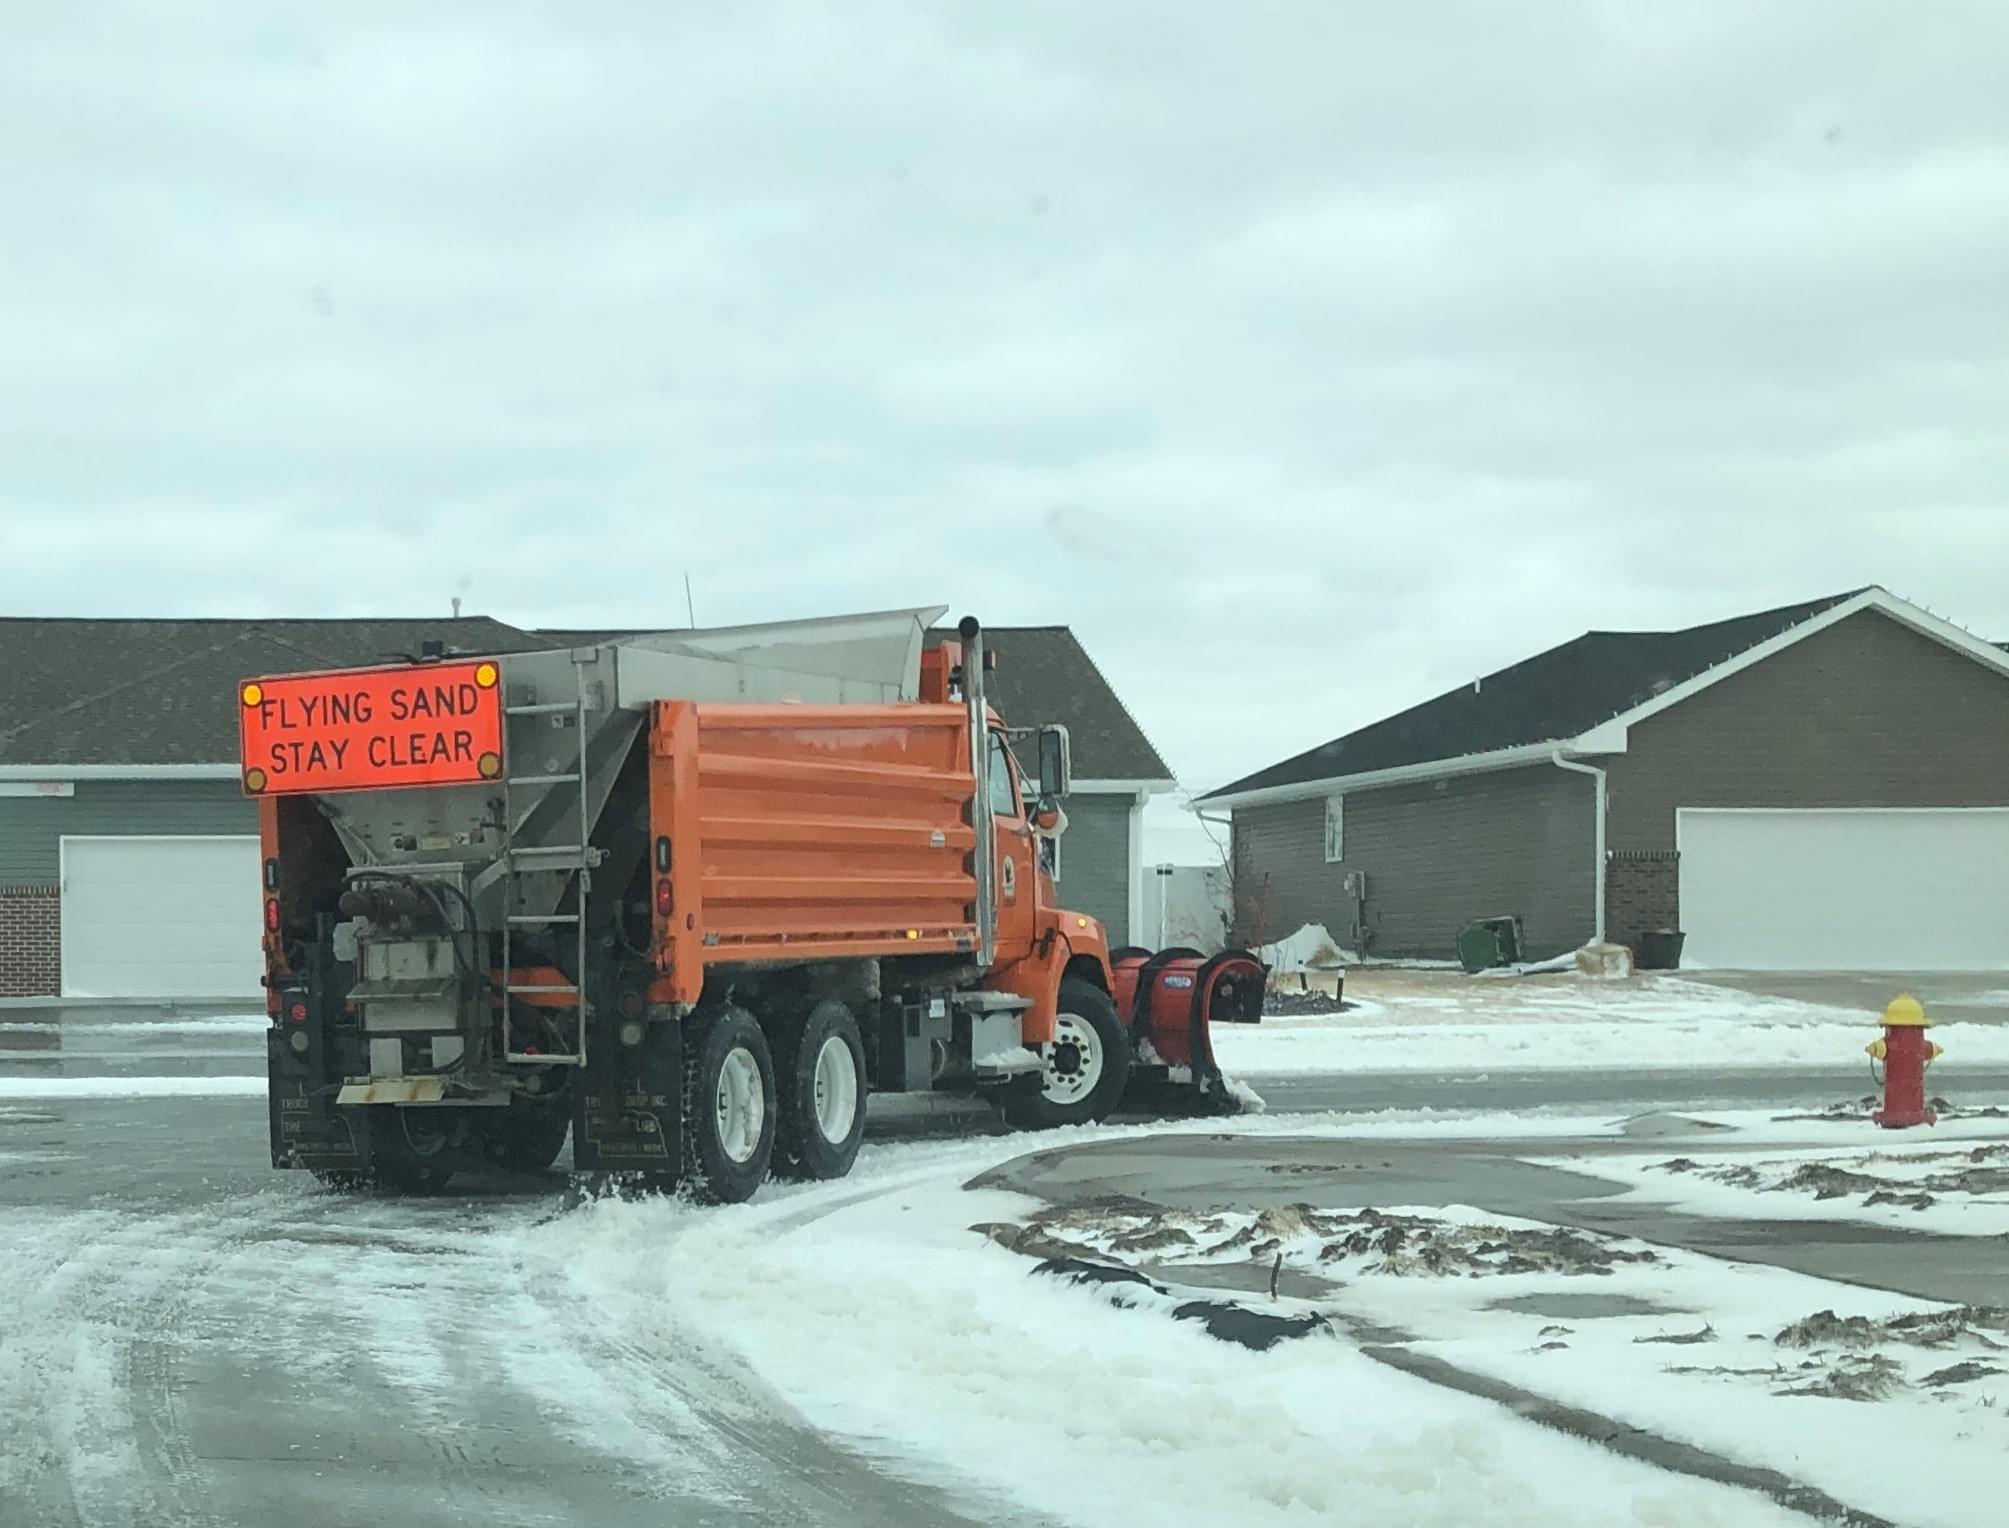 Declared Snow Emergency in Effect